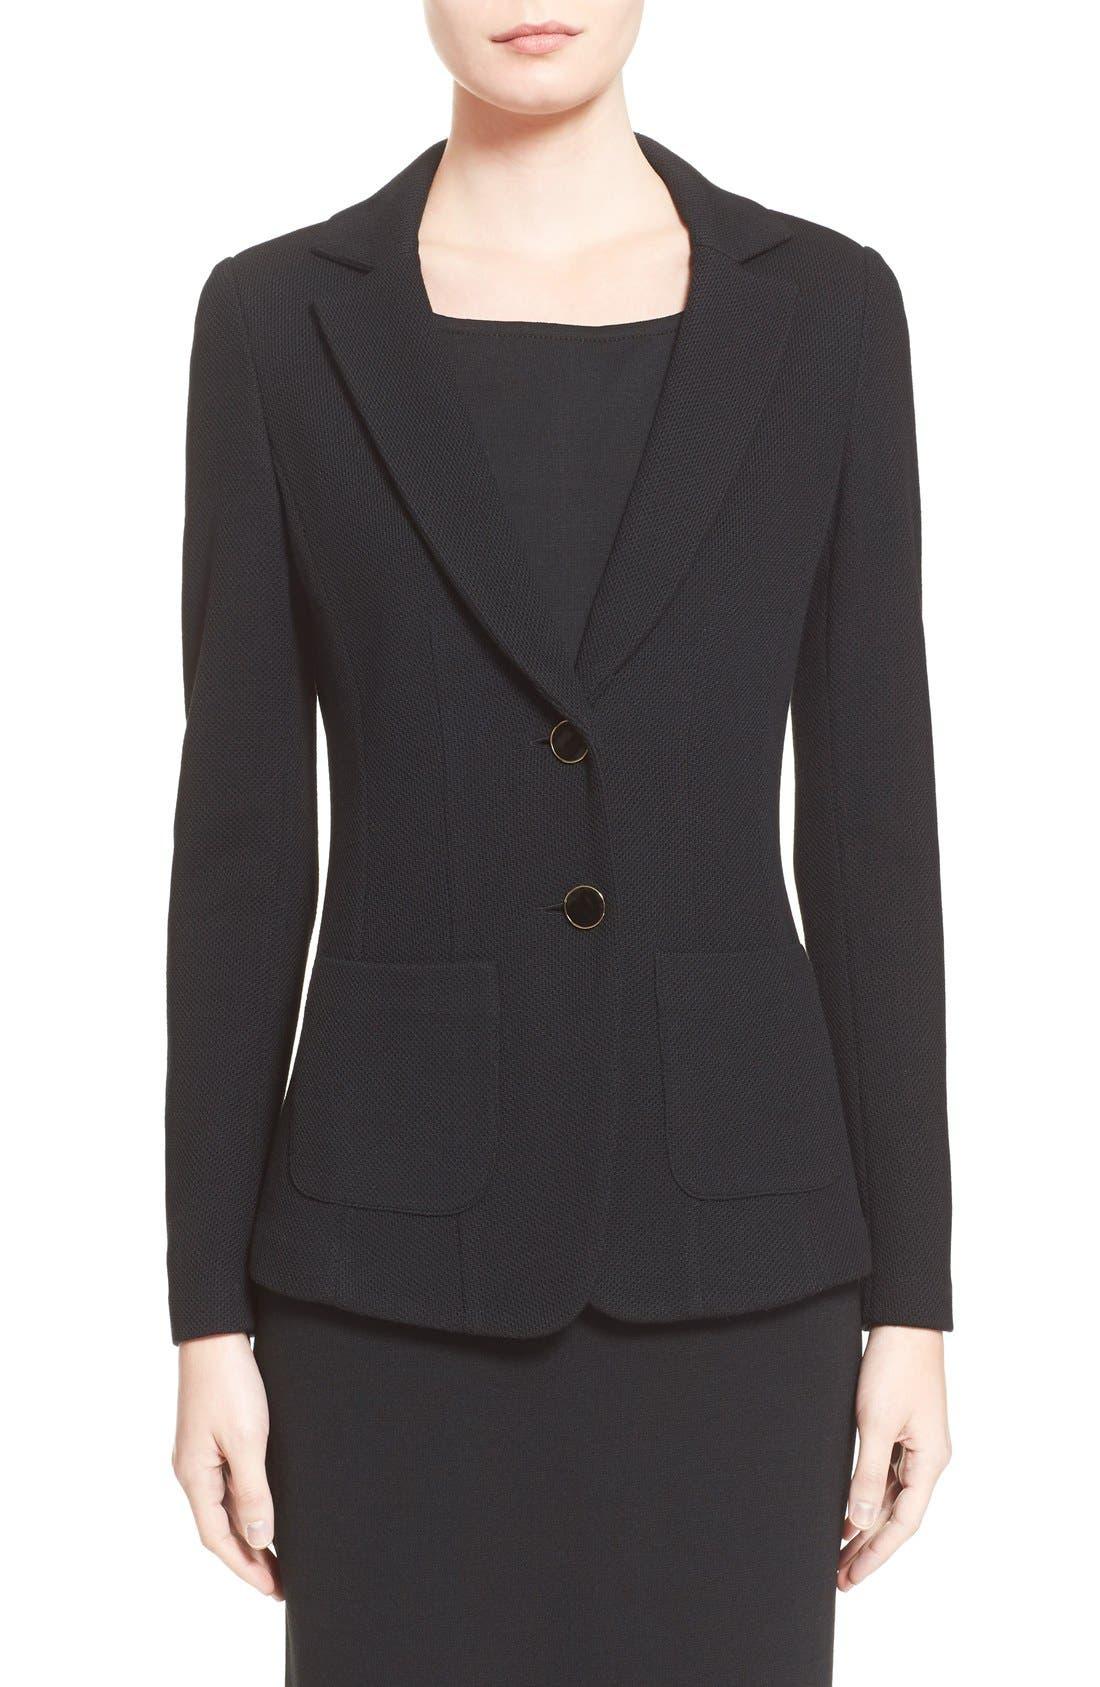 Milano Piqué Knit Jacket,                             Main thumbnail 1, color,                             CAVIAR